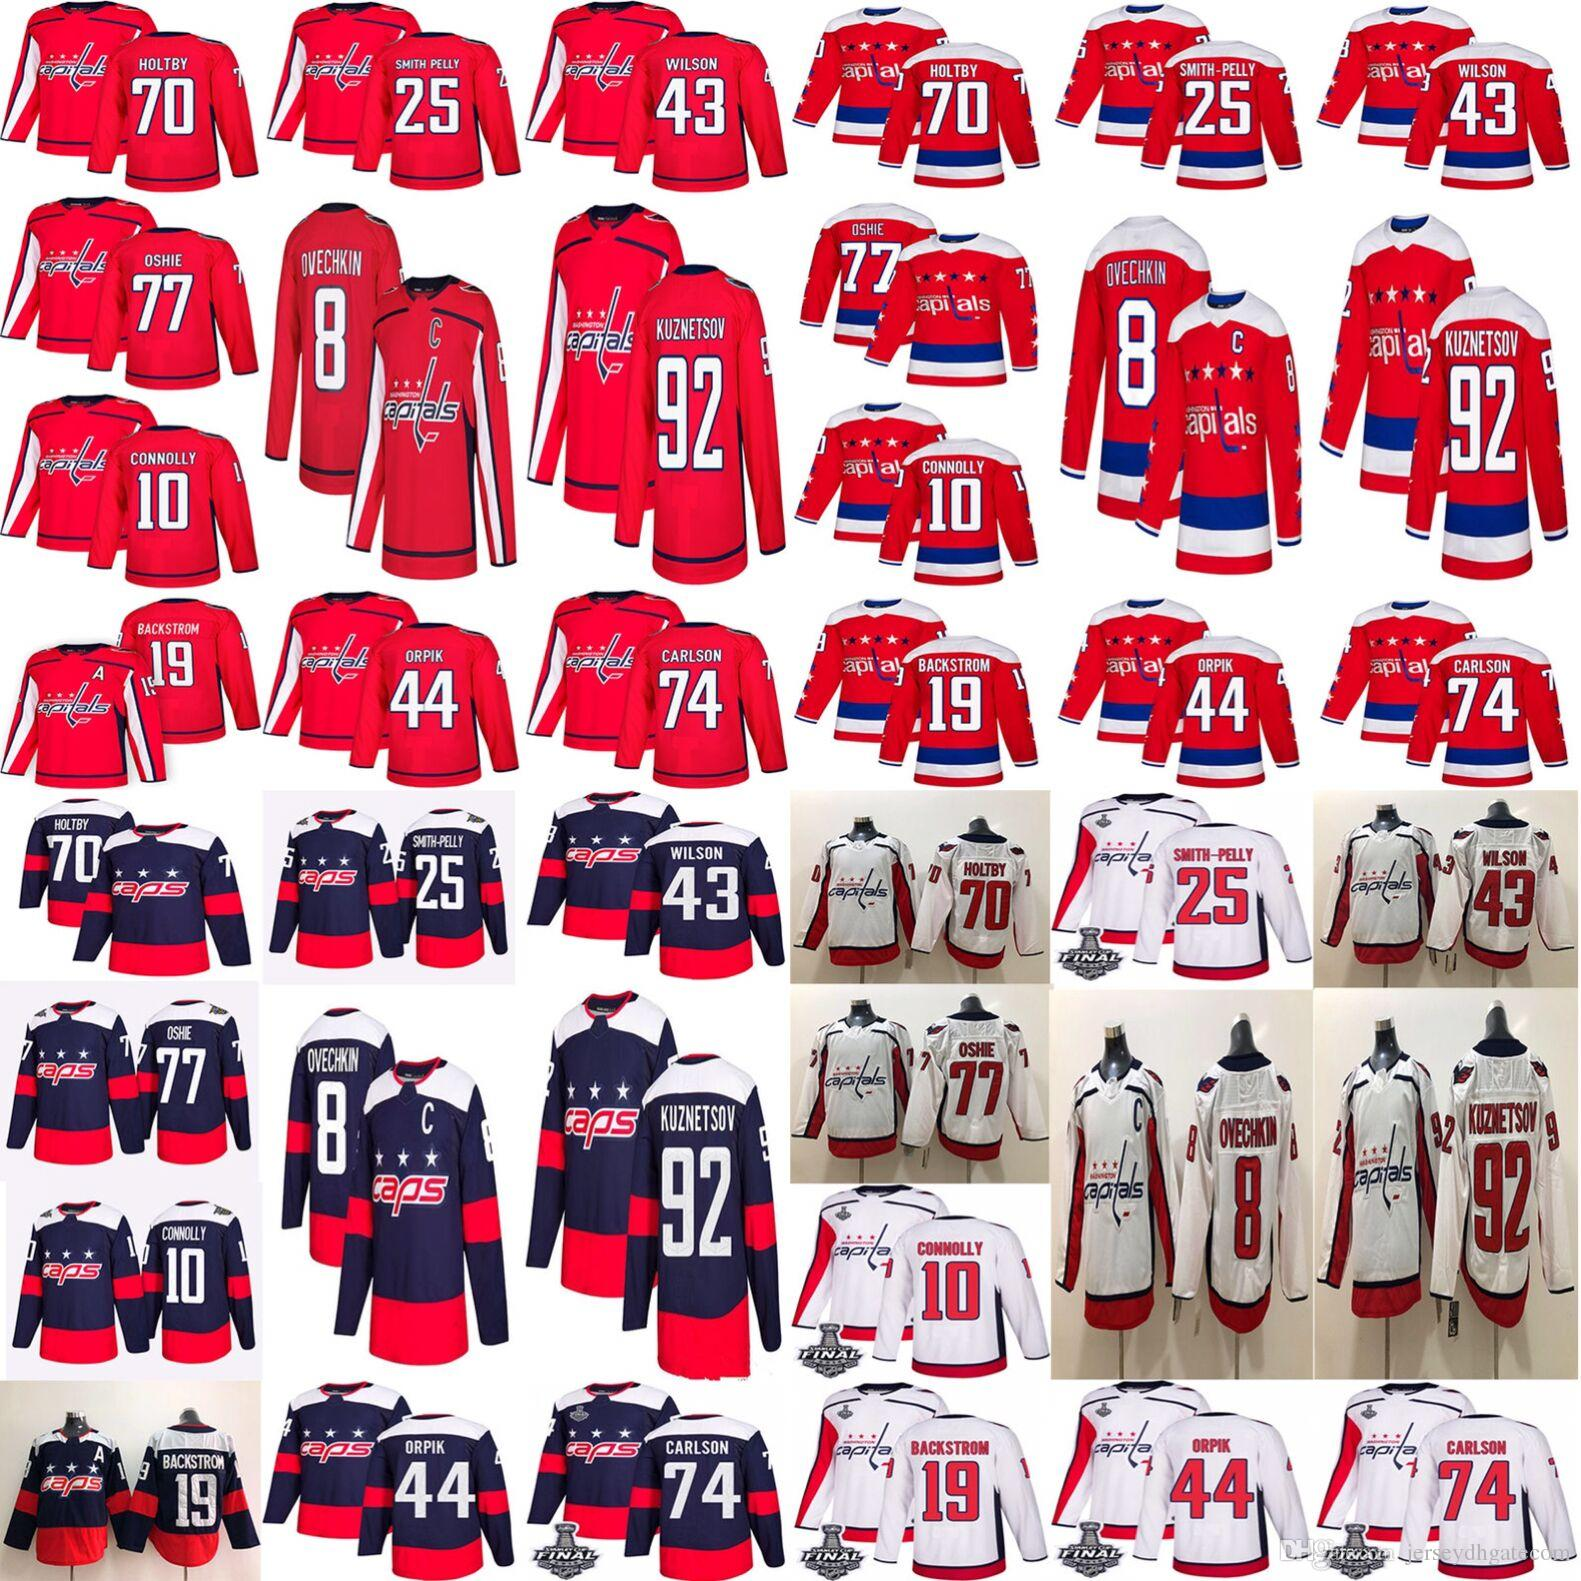 18-19 Stanley Cup Meister Washington Capitals Hockey 8 Alex Ovechkin 70 Braden Holtby 77 TJ Oshie 43 Tom Wilson 92 Kuznetsov Hockey Trikots